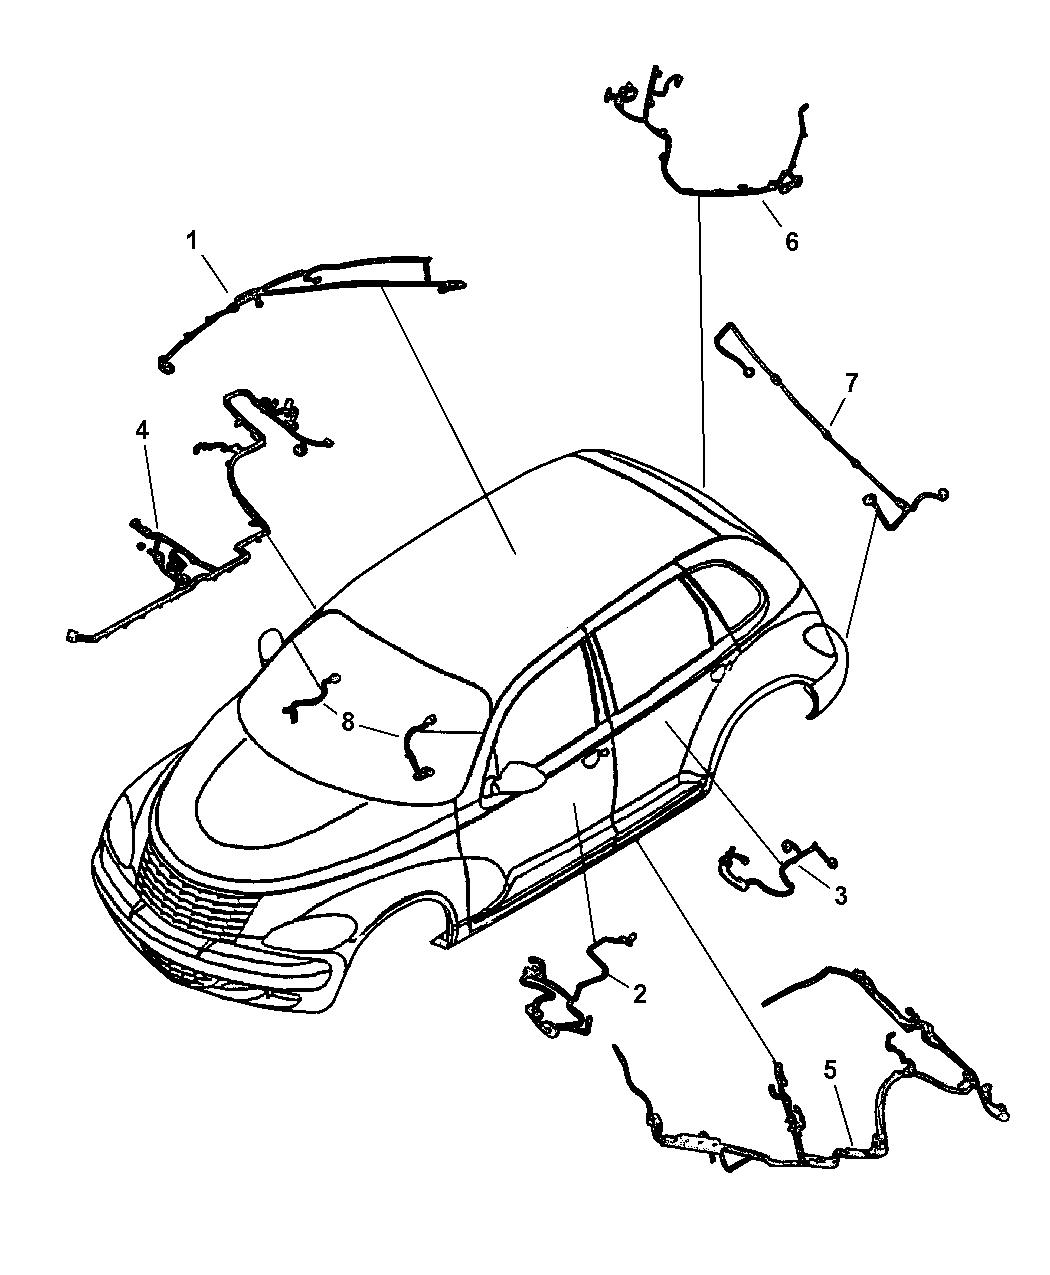 2001 Chrysler Pt Cruiser Wiring Body  U0026 Accessory